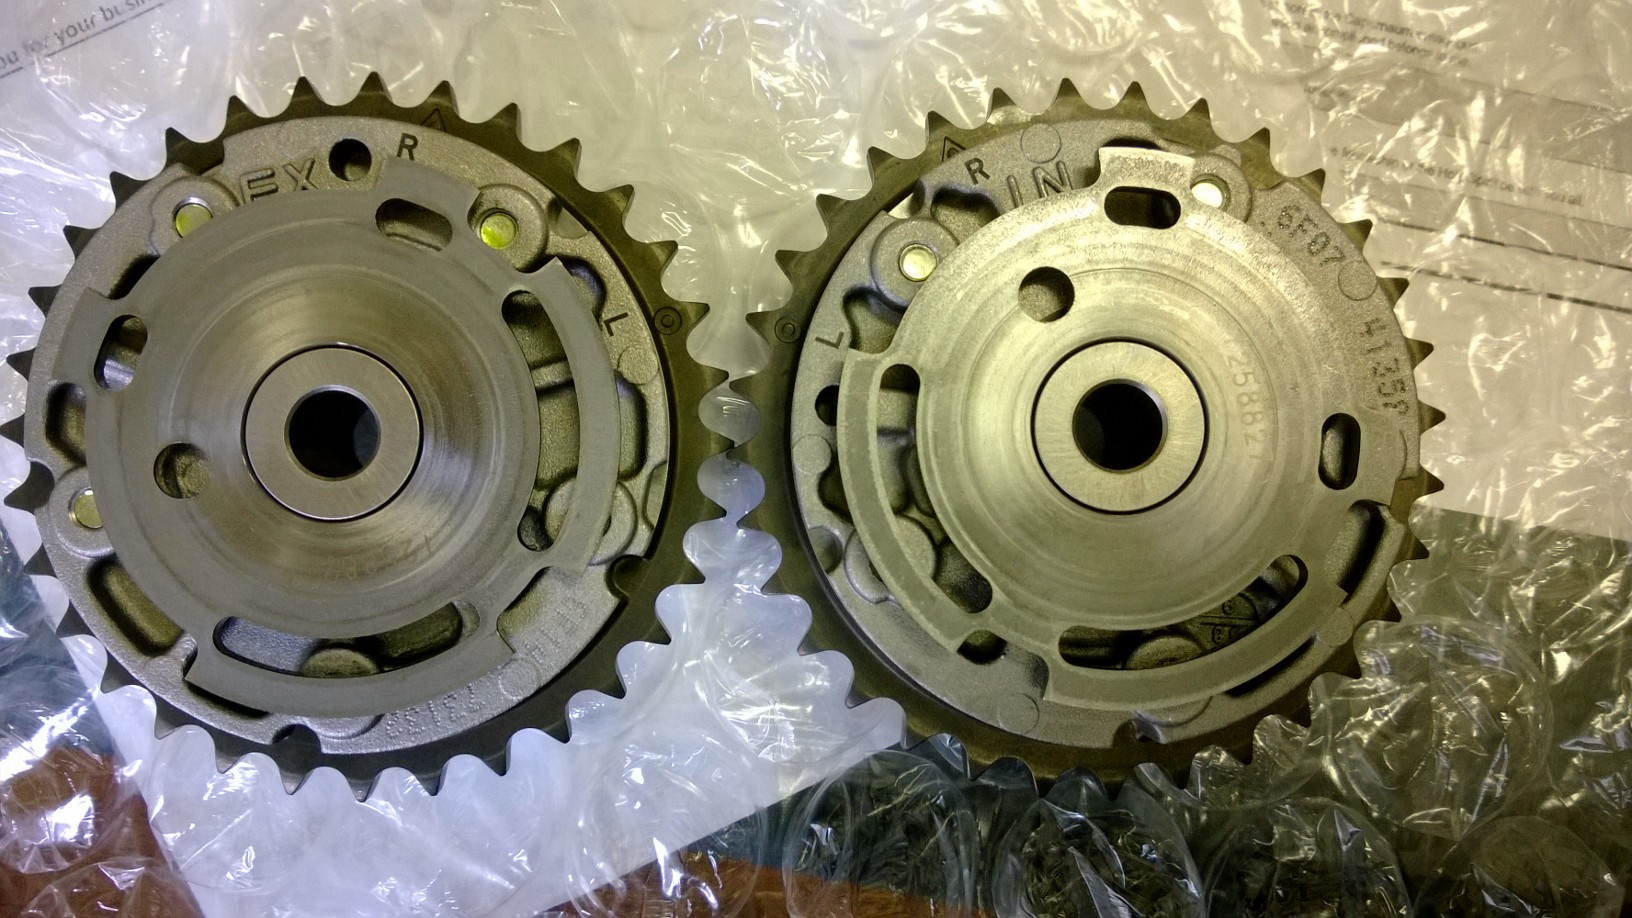 Just Finished Rebuilding My 36l Dohc Cad Engine After 3 Bearing Buick V6 Valve Timing Marks Full Size Image